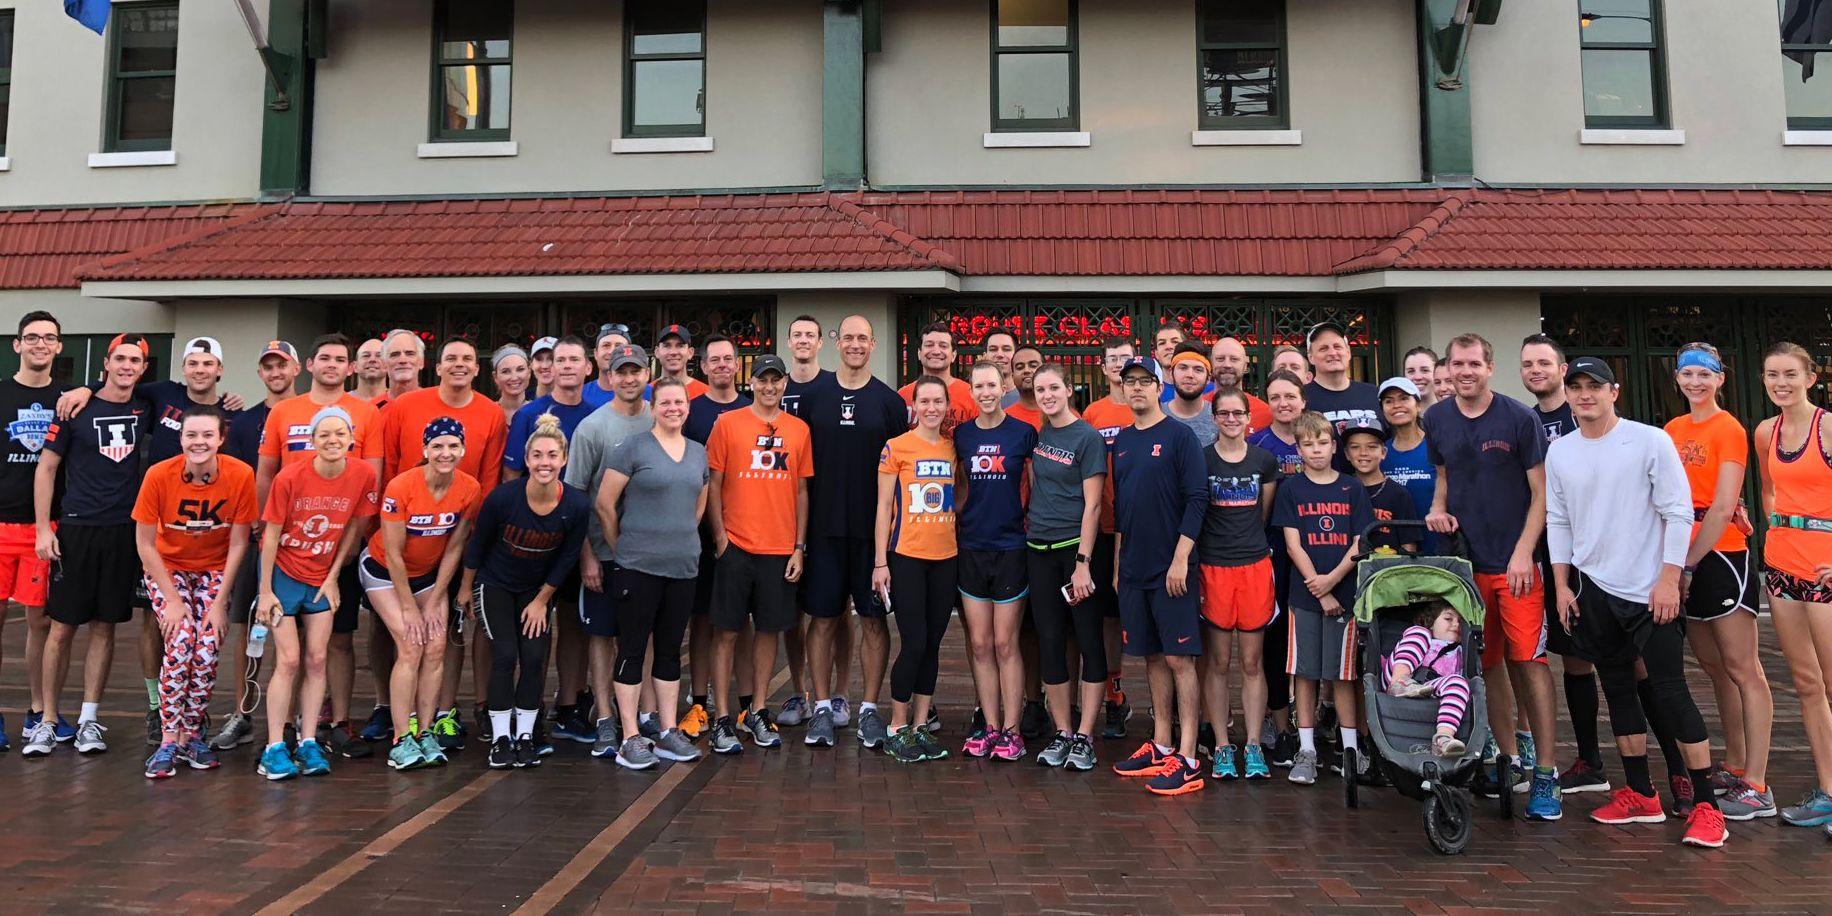 Josh Whitman Illinois Run Club